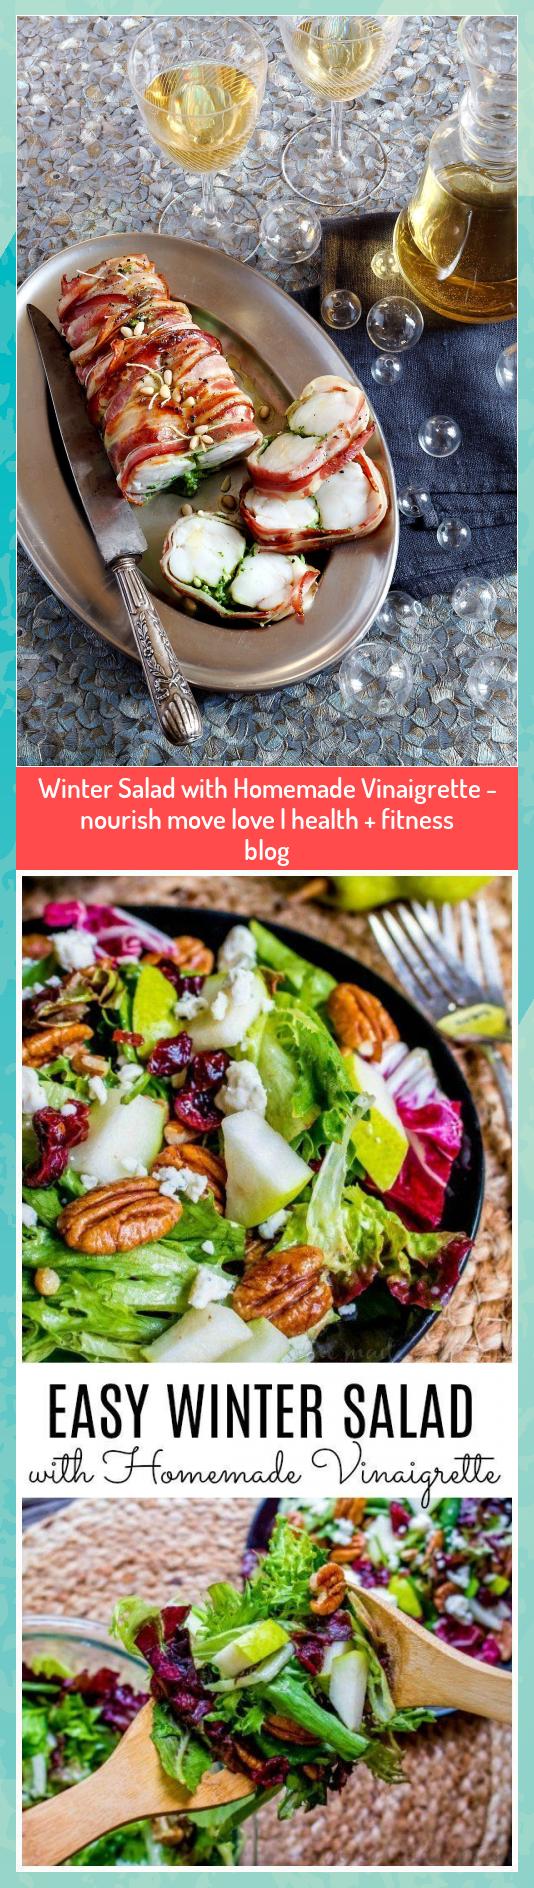 Winter Salad with Homemade Vinaigrette - nourish move love | health + fitness blog #blog #fitness #h...